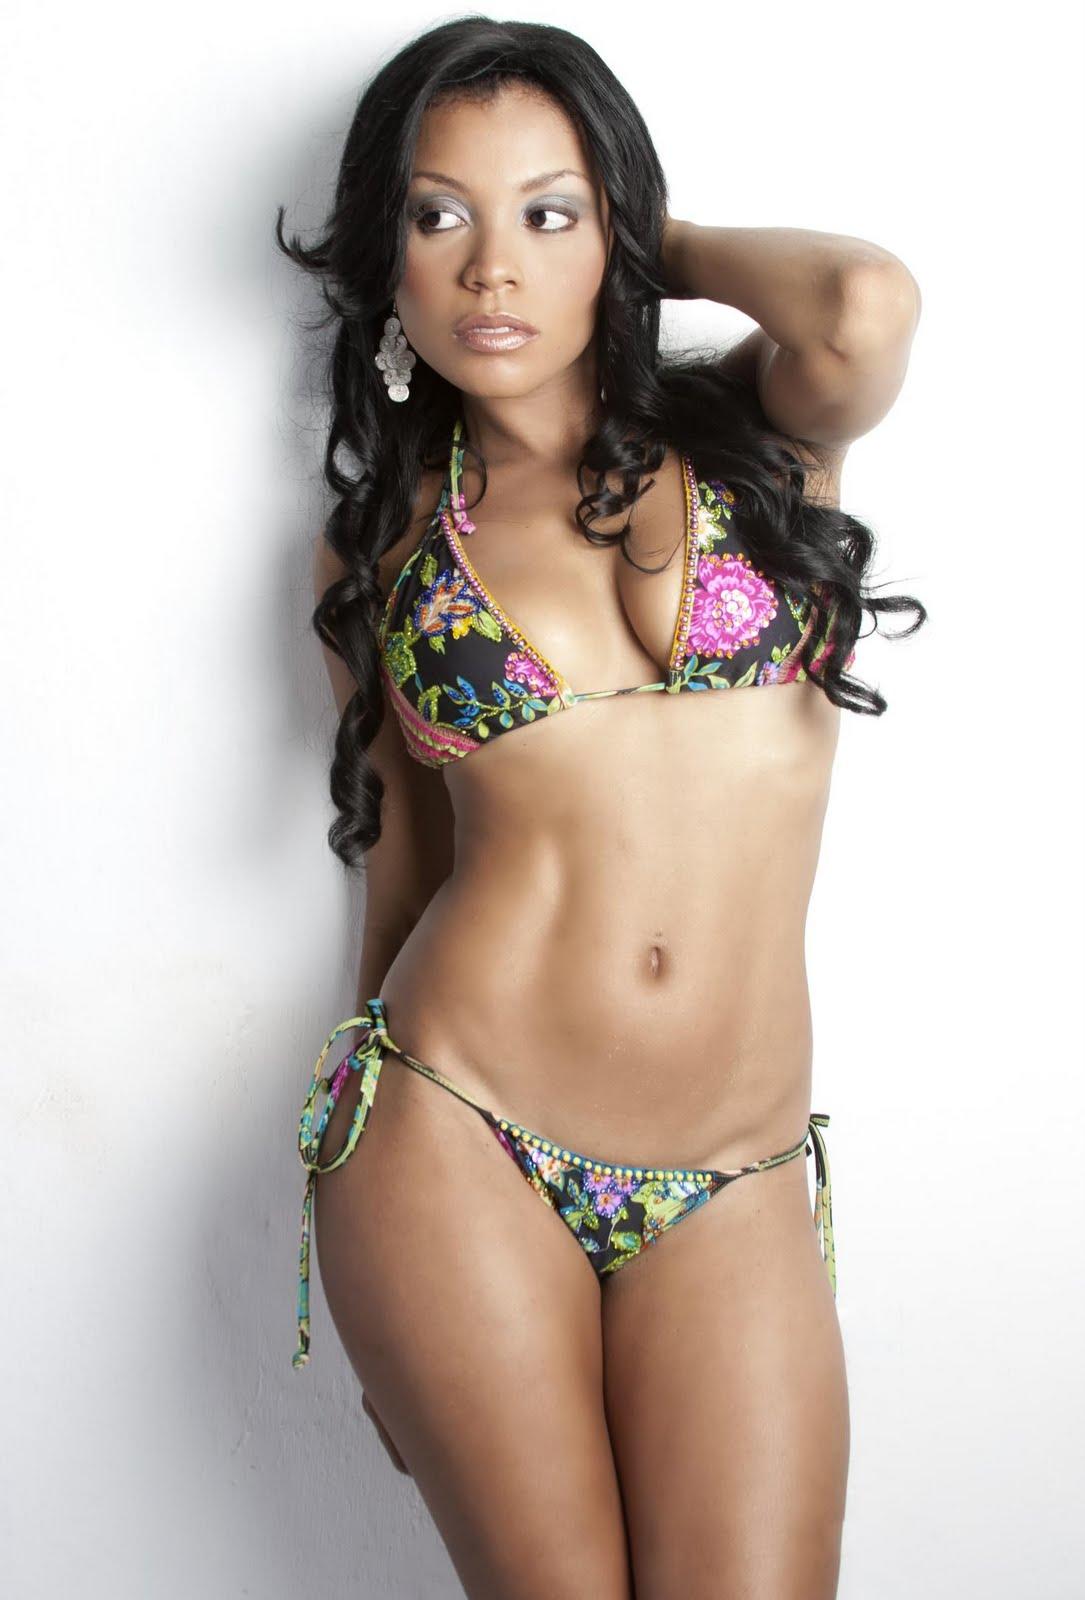 male models black male models pics plus size models wanted ireland ...